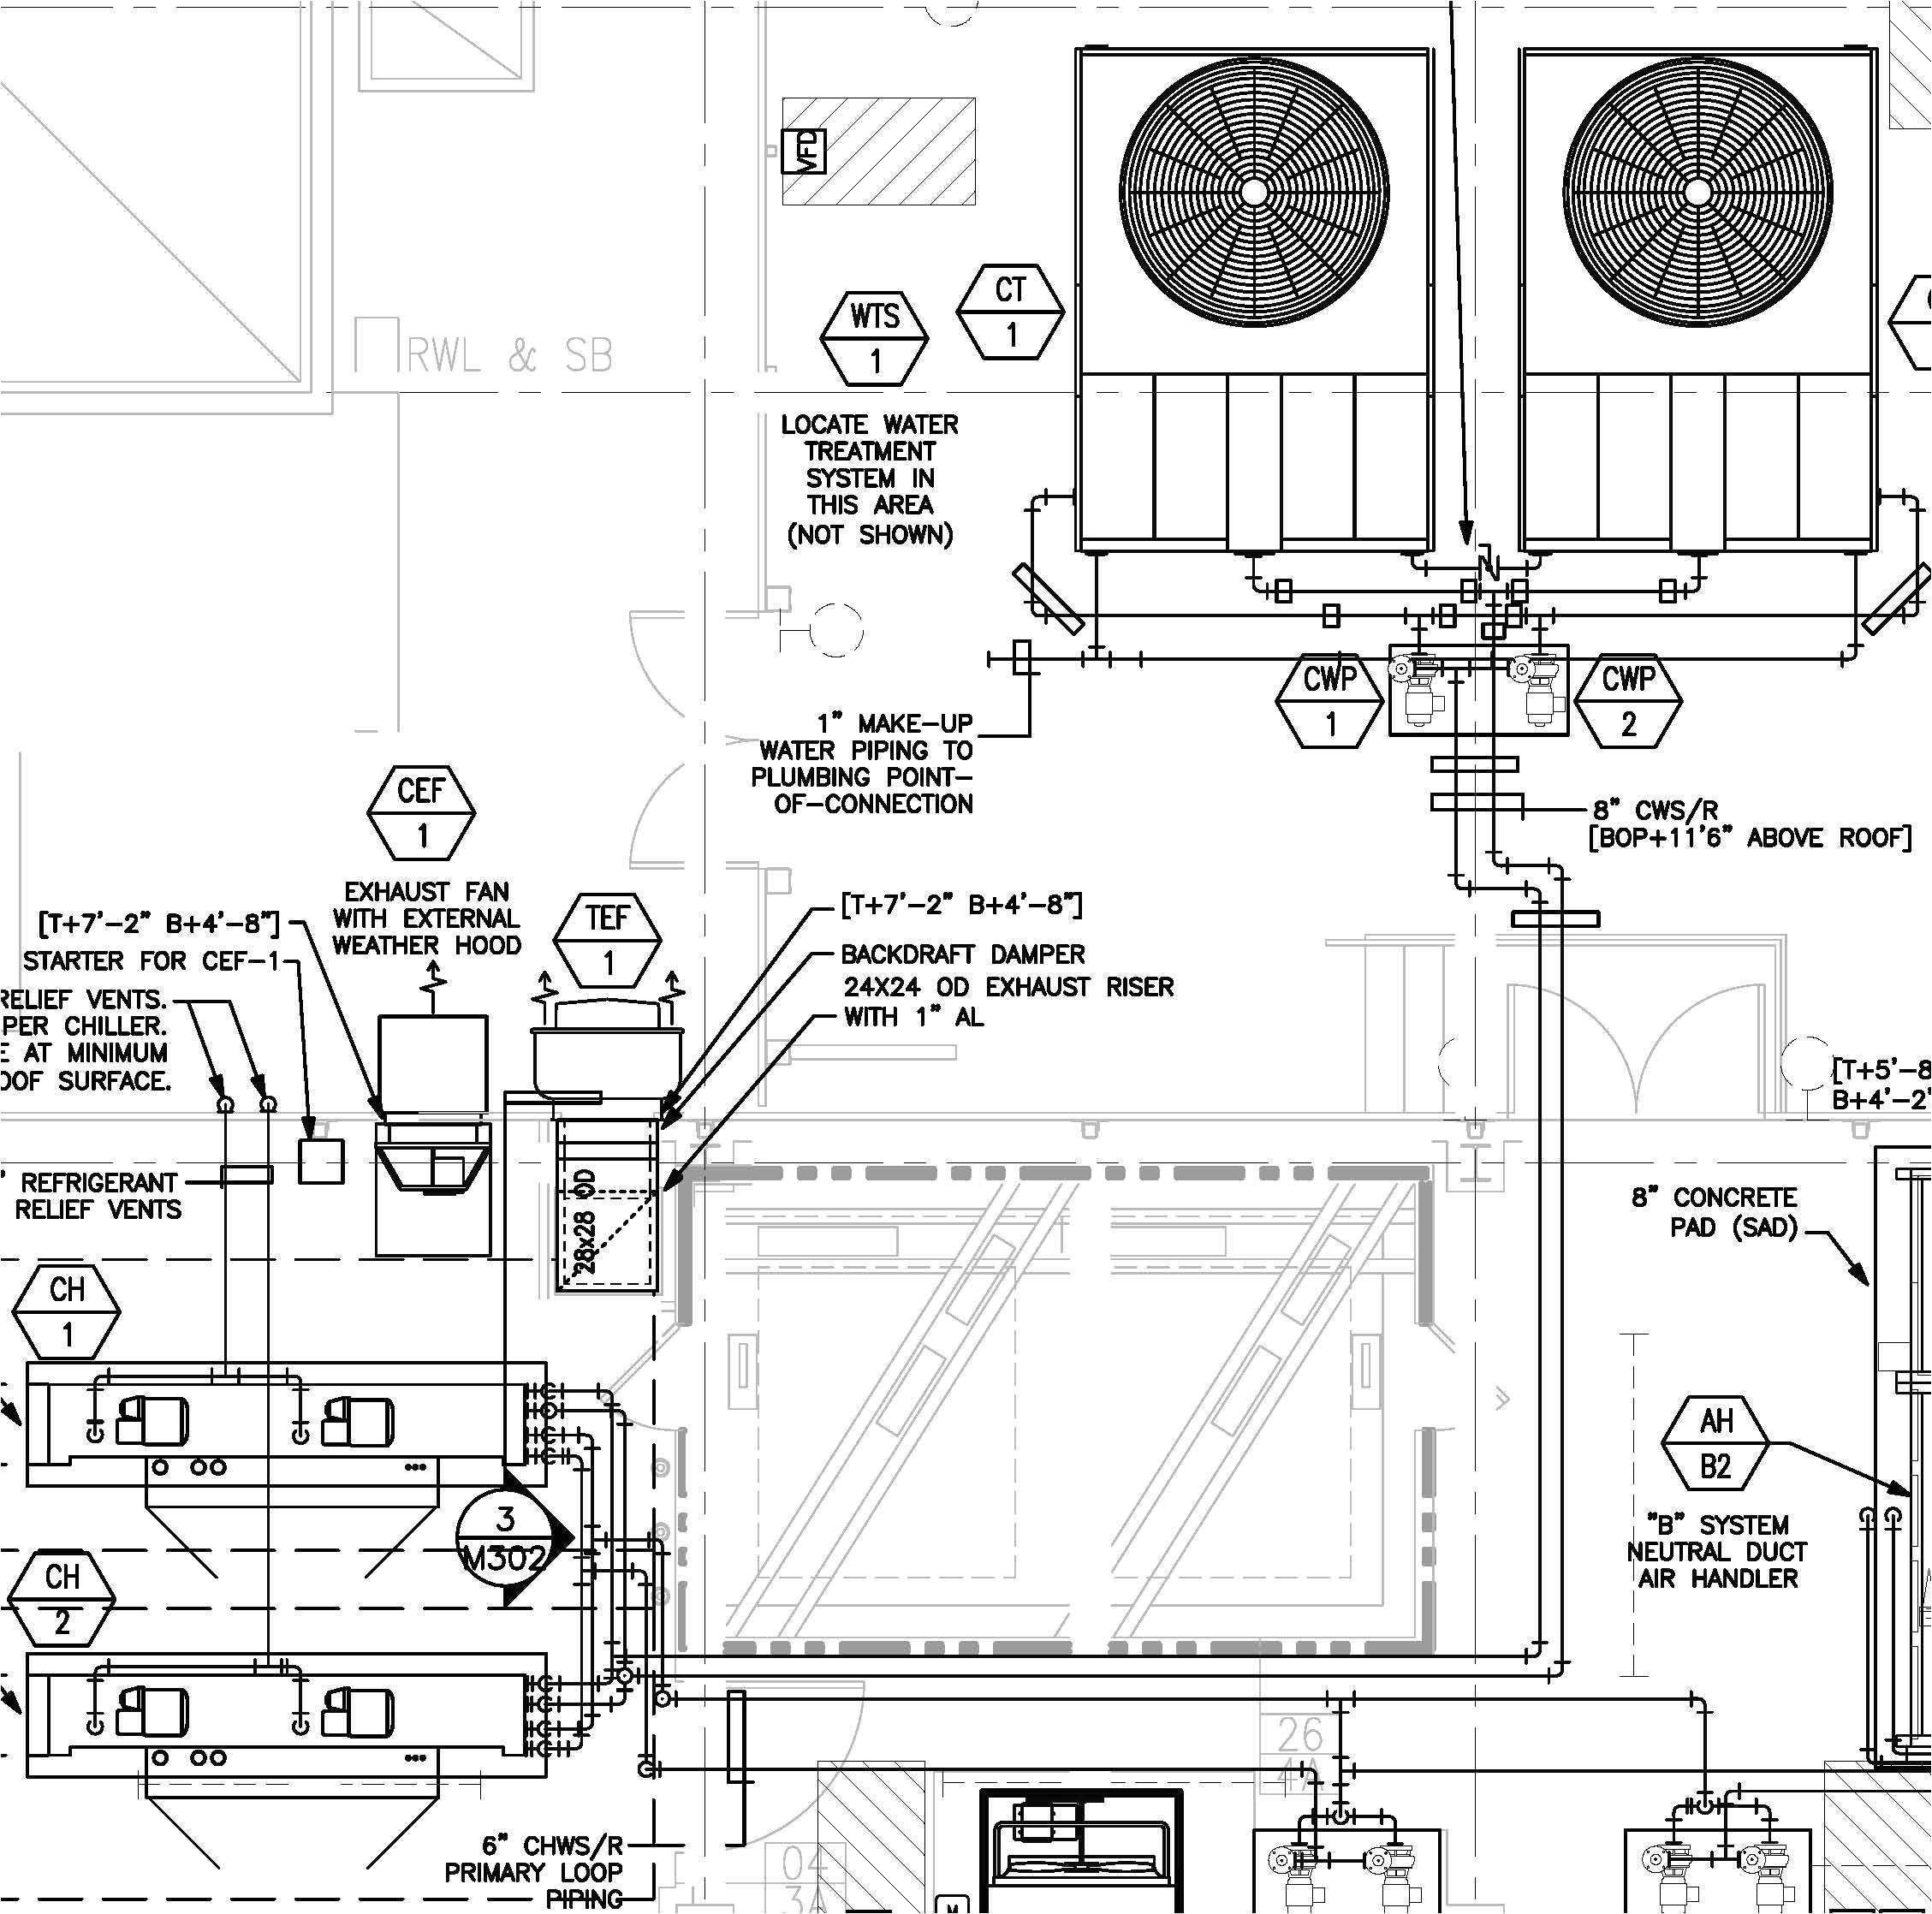 hvac air conditioning wiring diagrams wiring diagram database diagram further how does air conditioning work diagram wiring